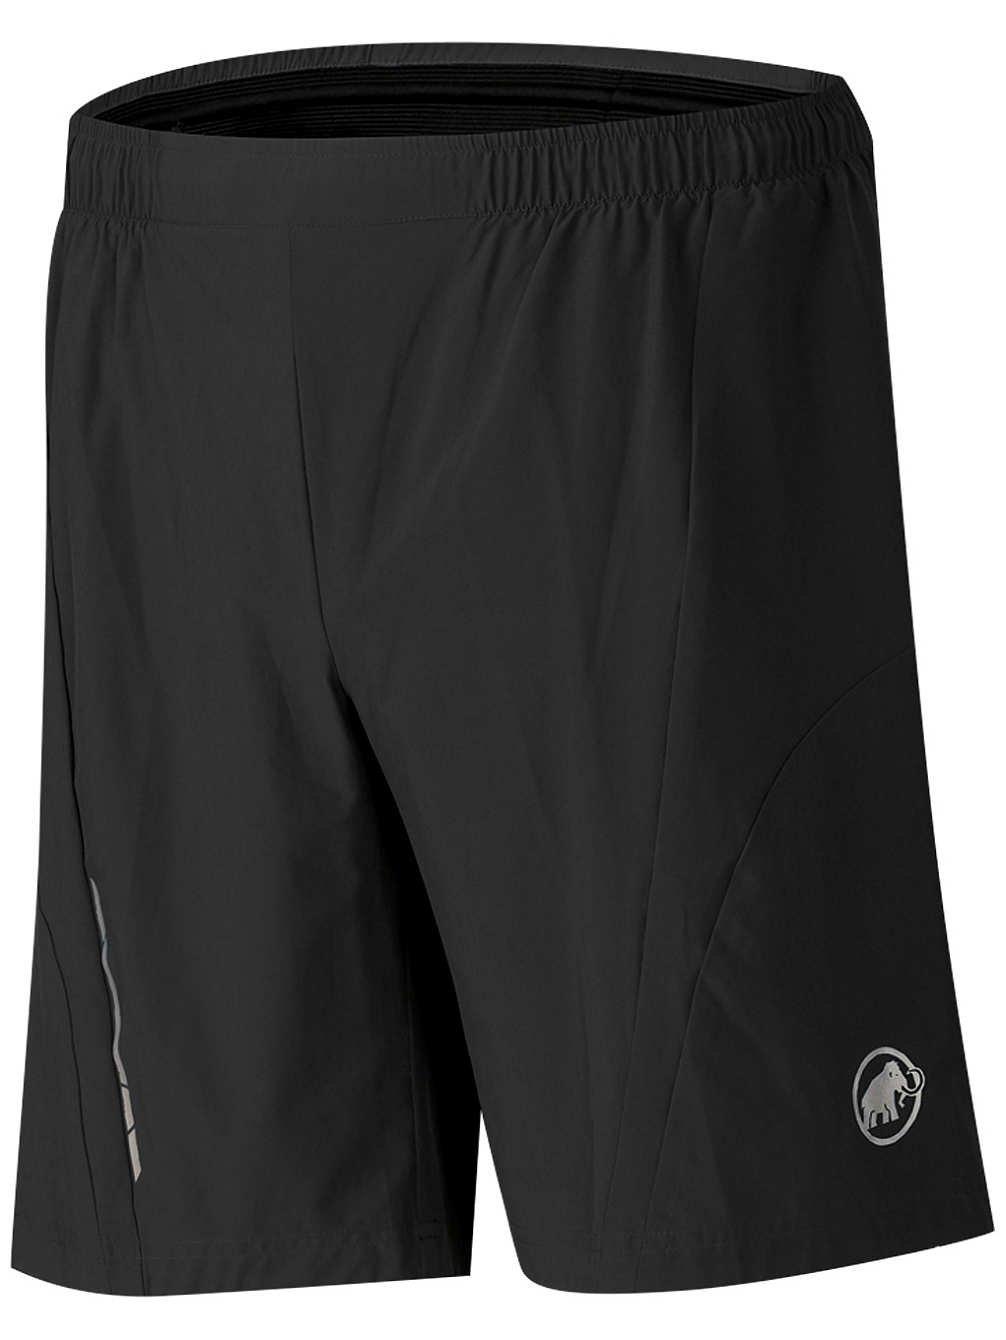 MTR 141 Shorts Damen Long